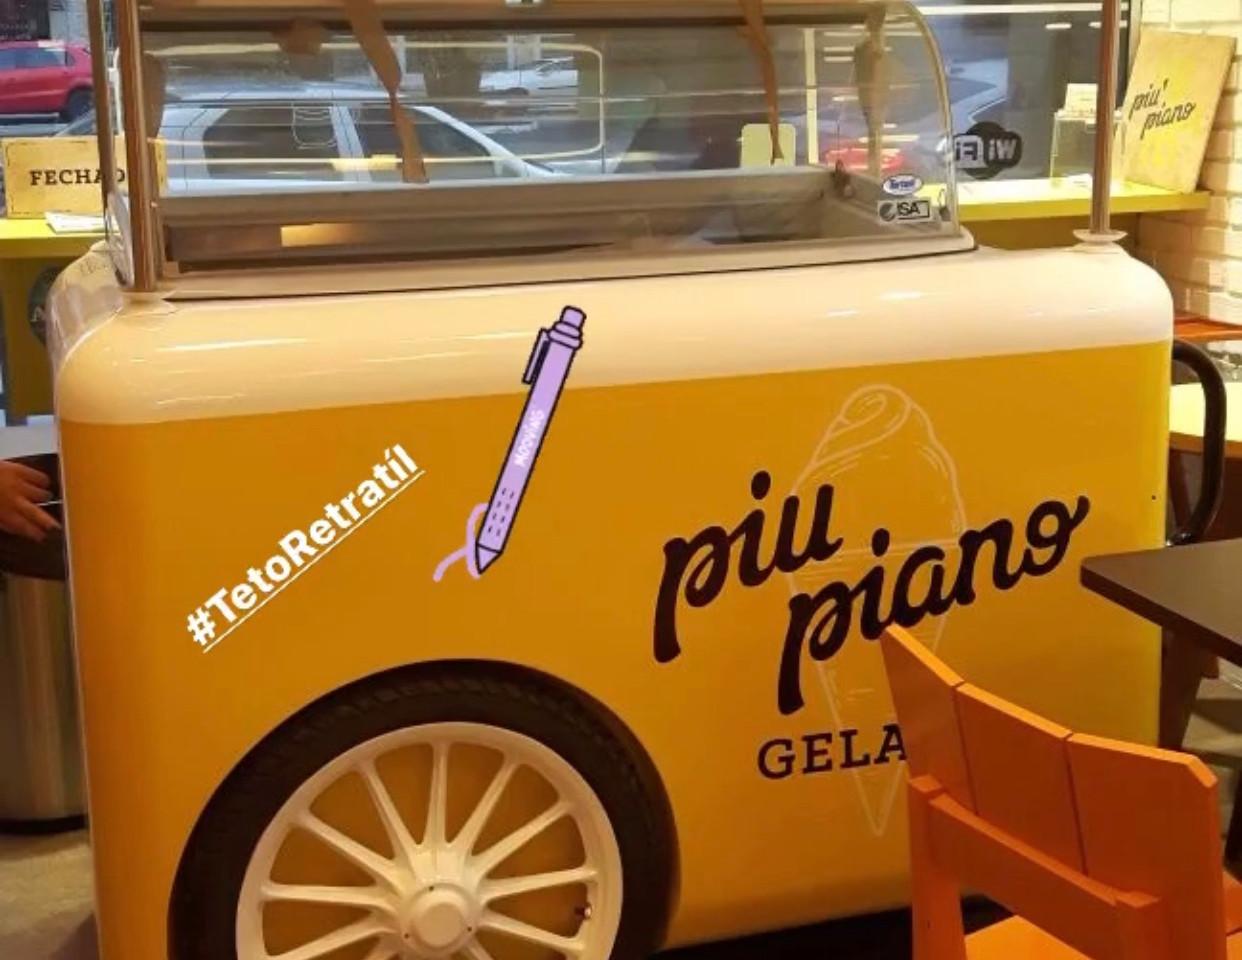 DiAntonio gelato cart.jpg